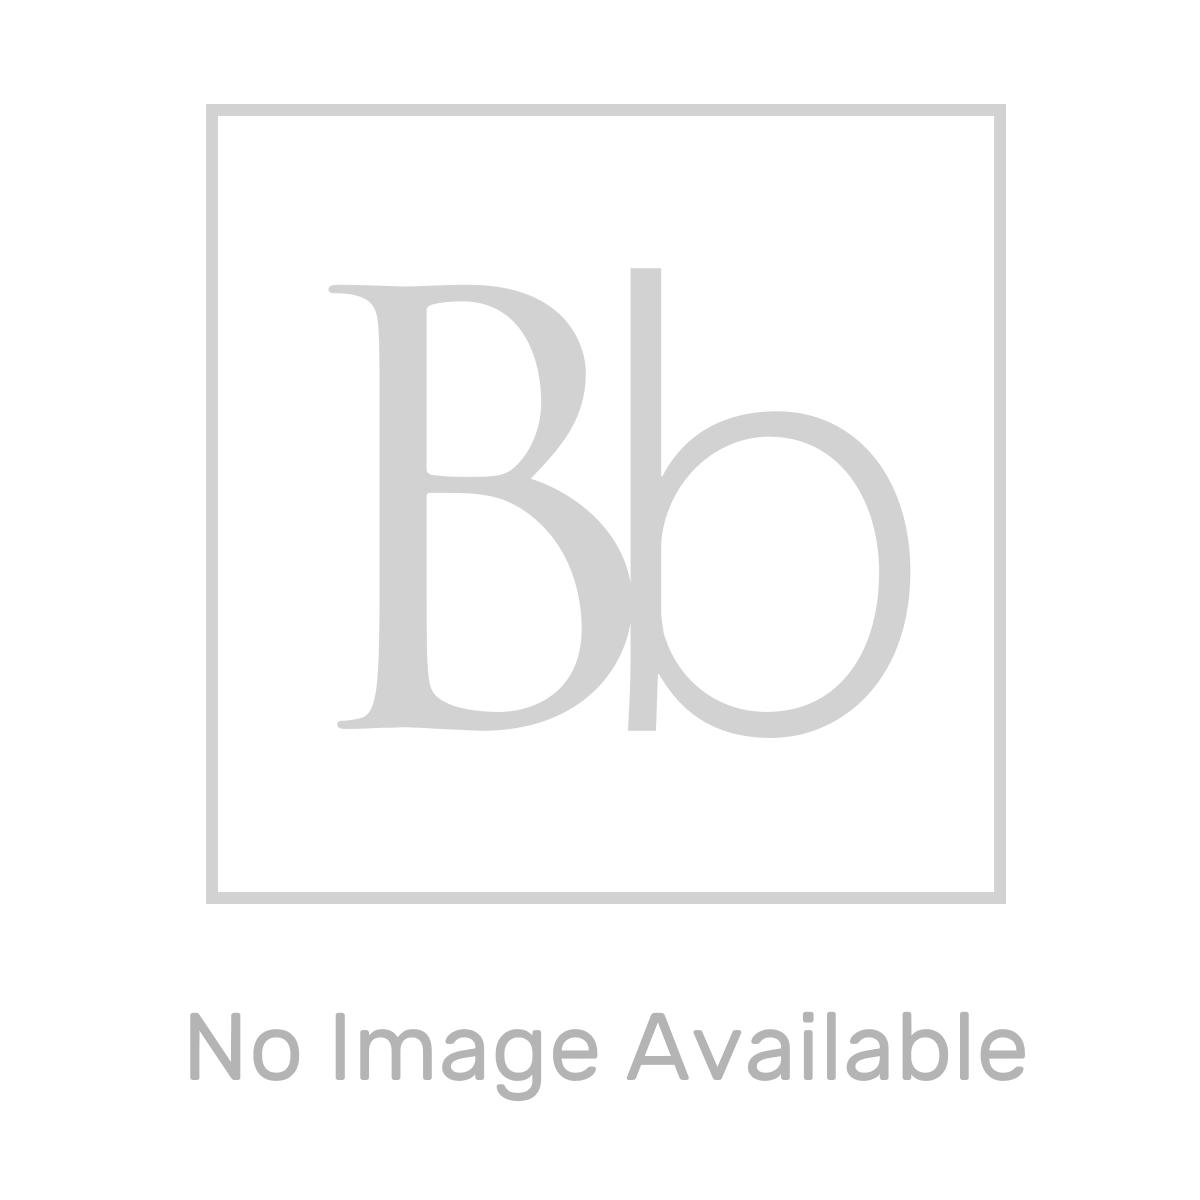 Nuie Athena Hacienda Black 2 Drawer Floor Standing Vanity Unit with 40mm Profile Basin 600mm Line Drawing